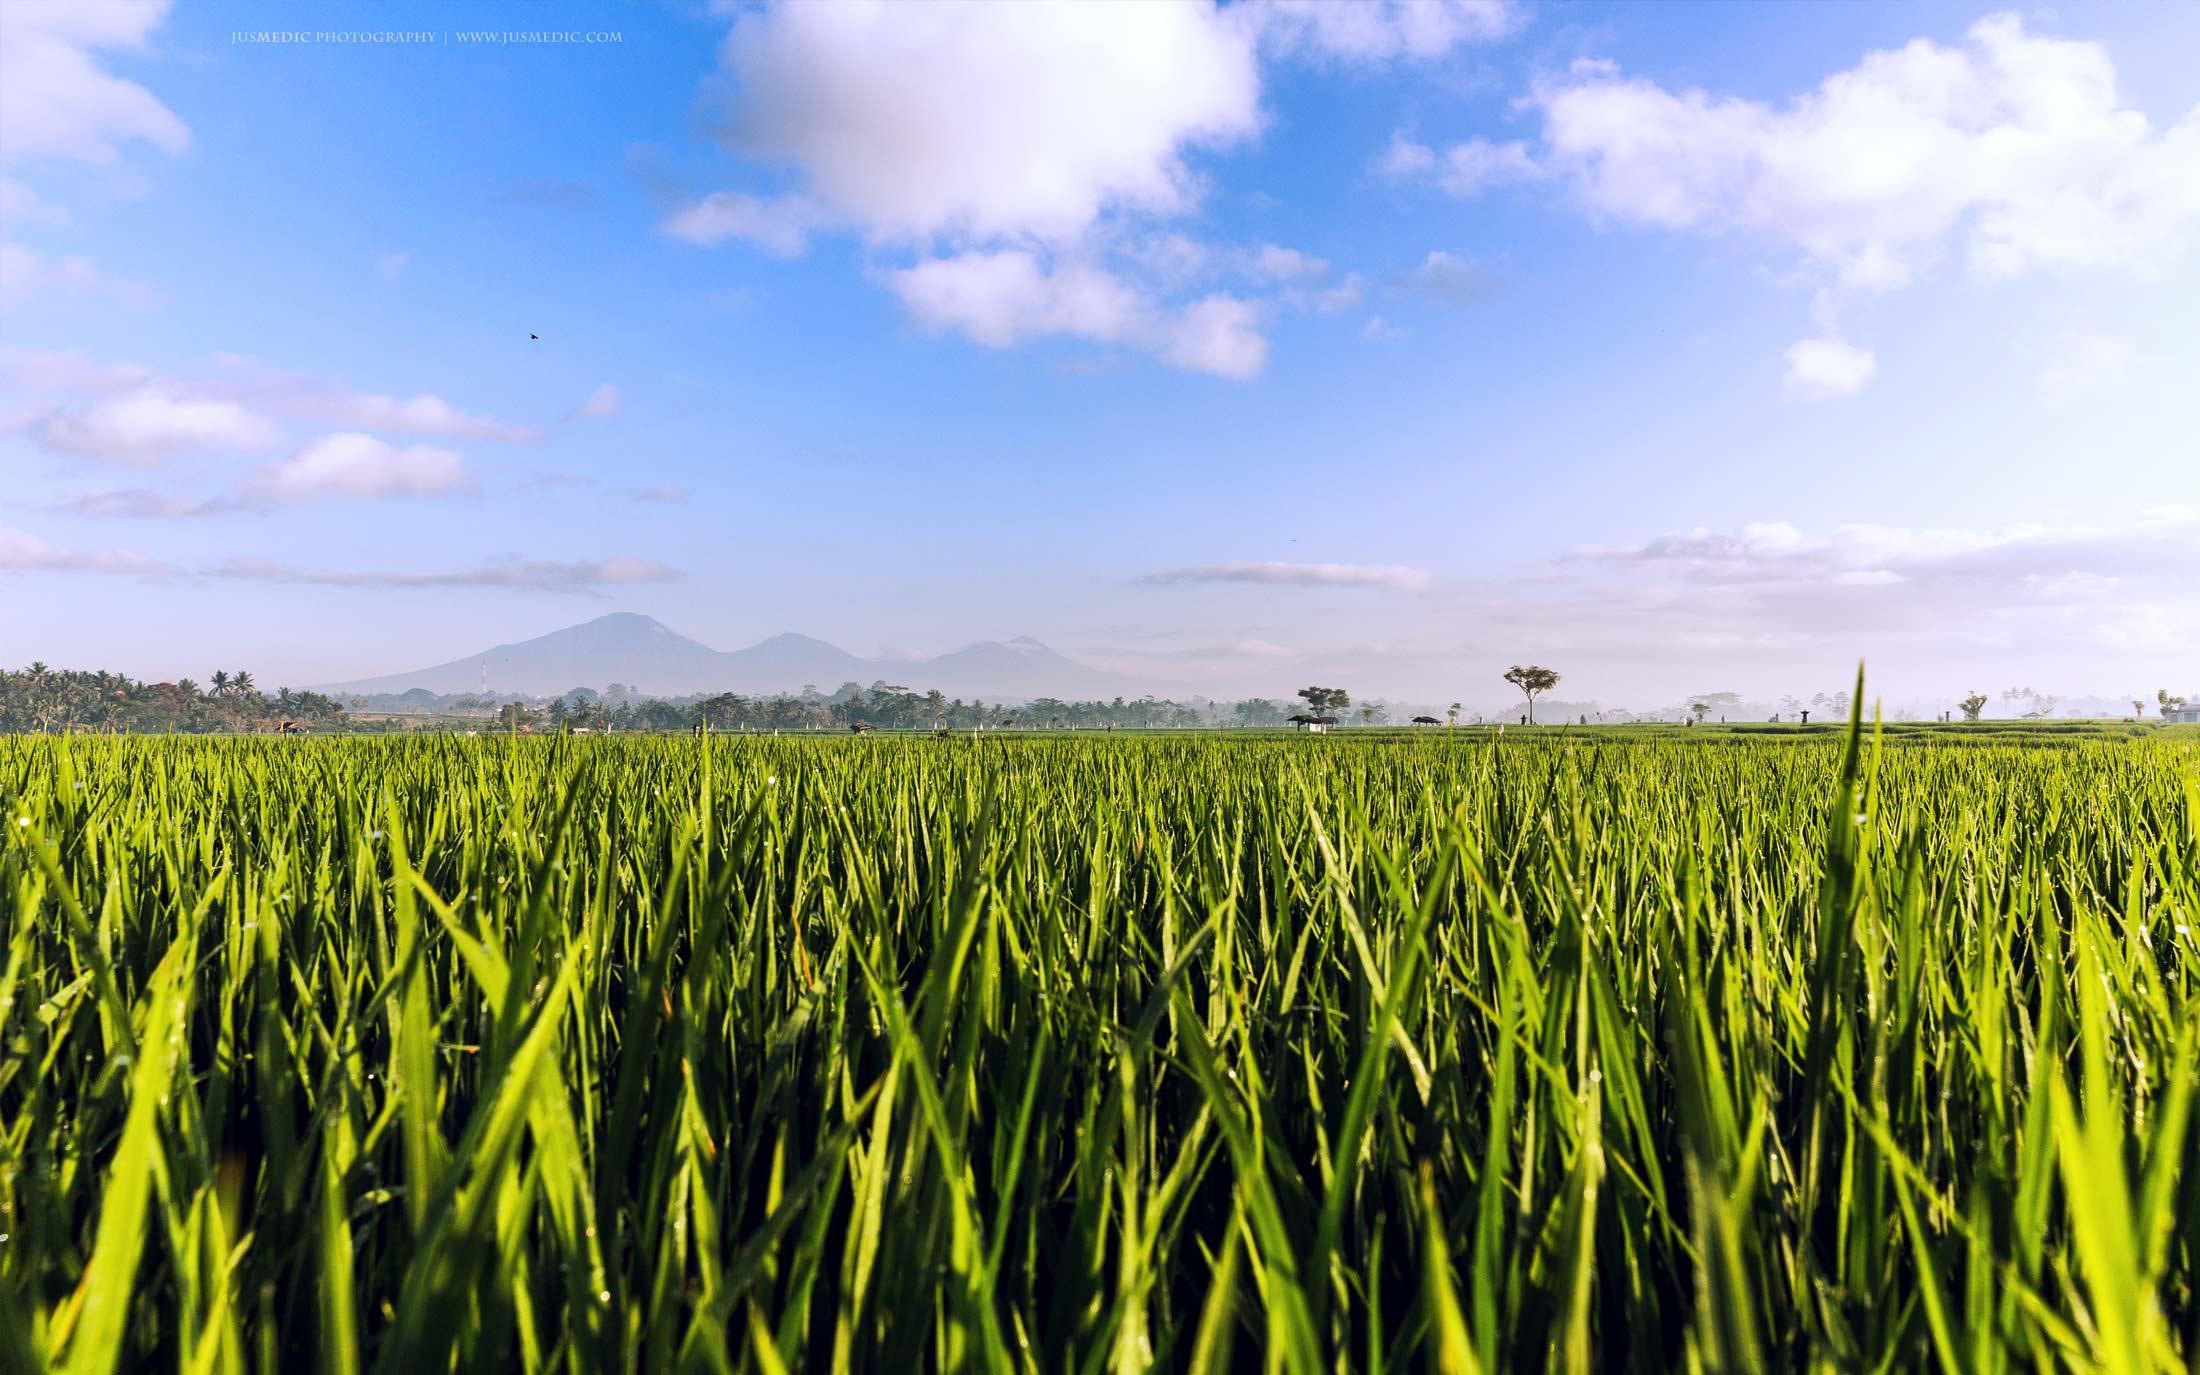 10-15-October-BALI-Ricefields-jusmedic.com-2200px